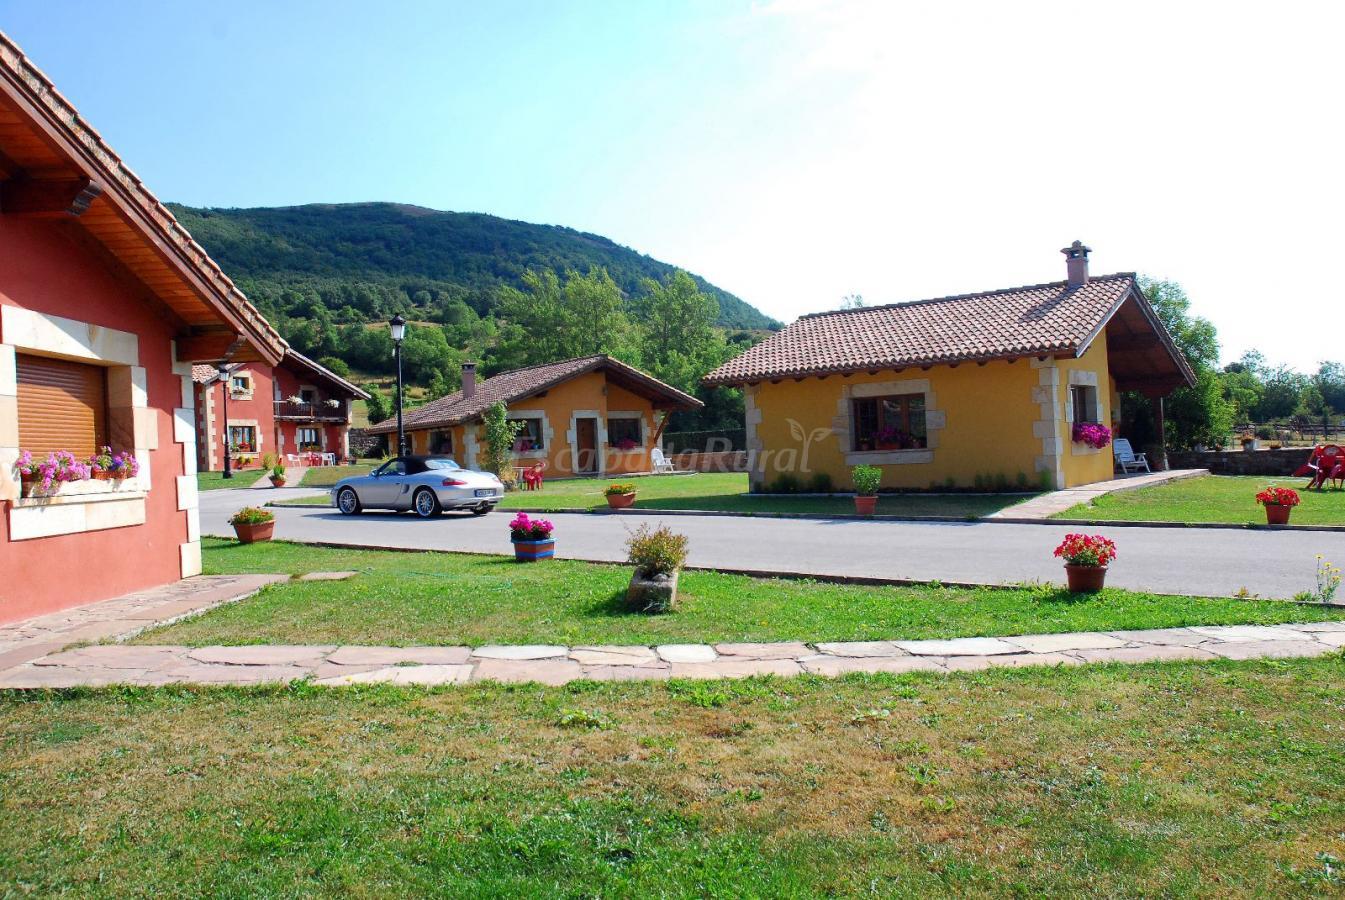 Fotos de casucas la guariza casa rural en fontibre for Casa rural con piscina climatizada cantabria